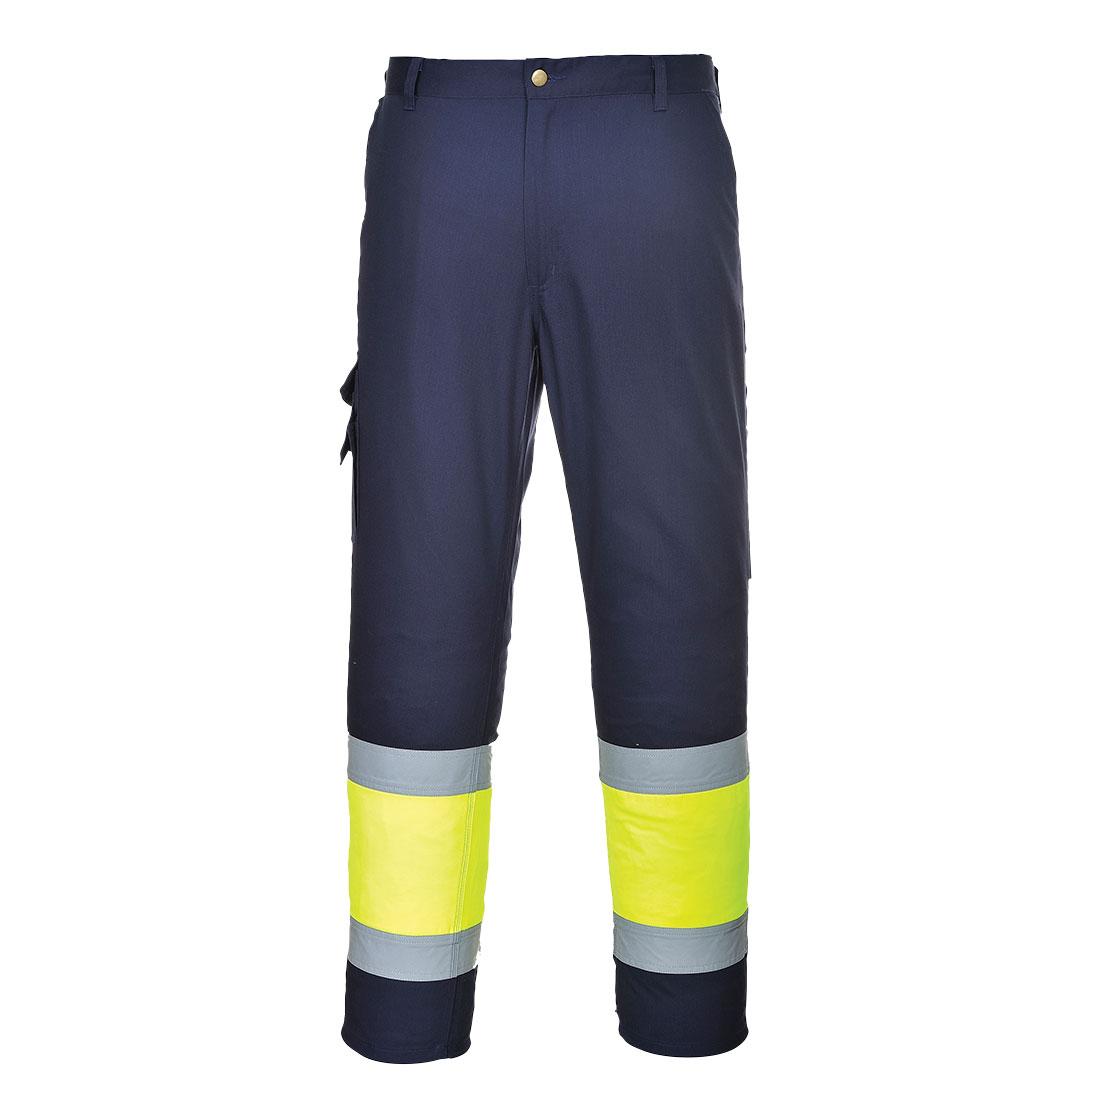 Portwest Hi-Vis Bicolor Combat Trousers (Geel/Navy) XL